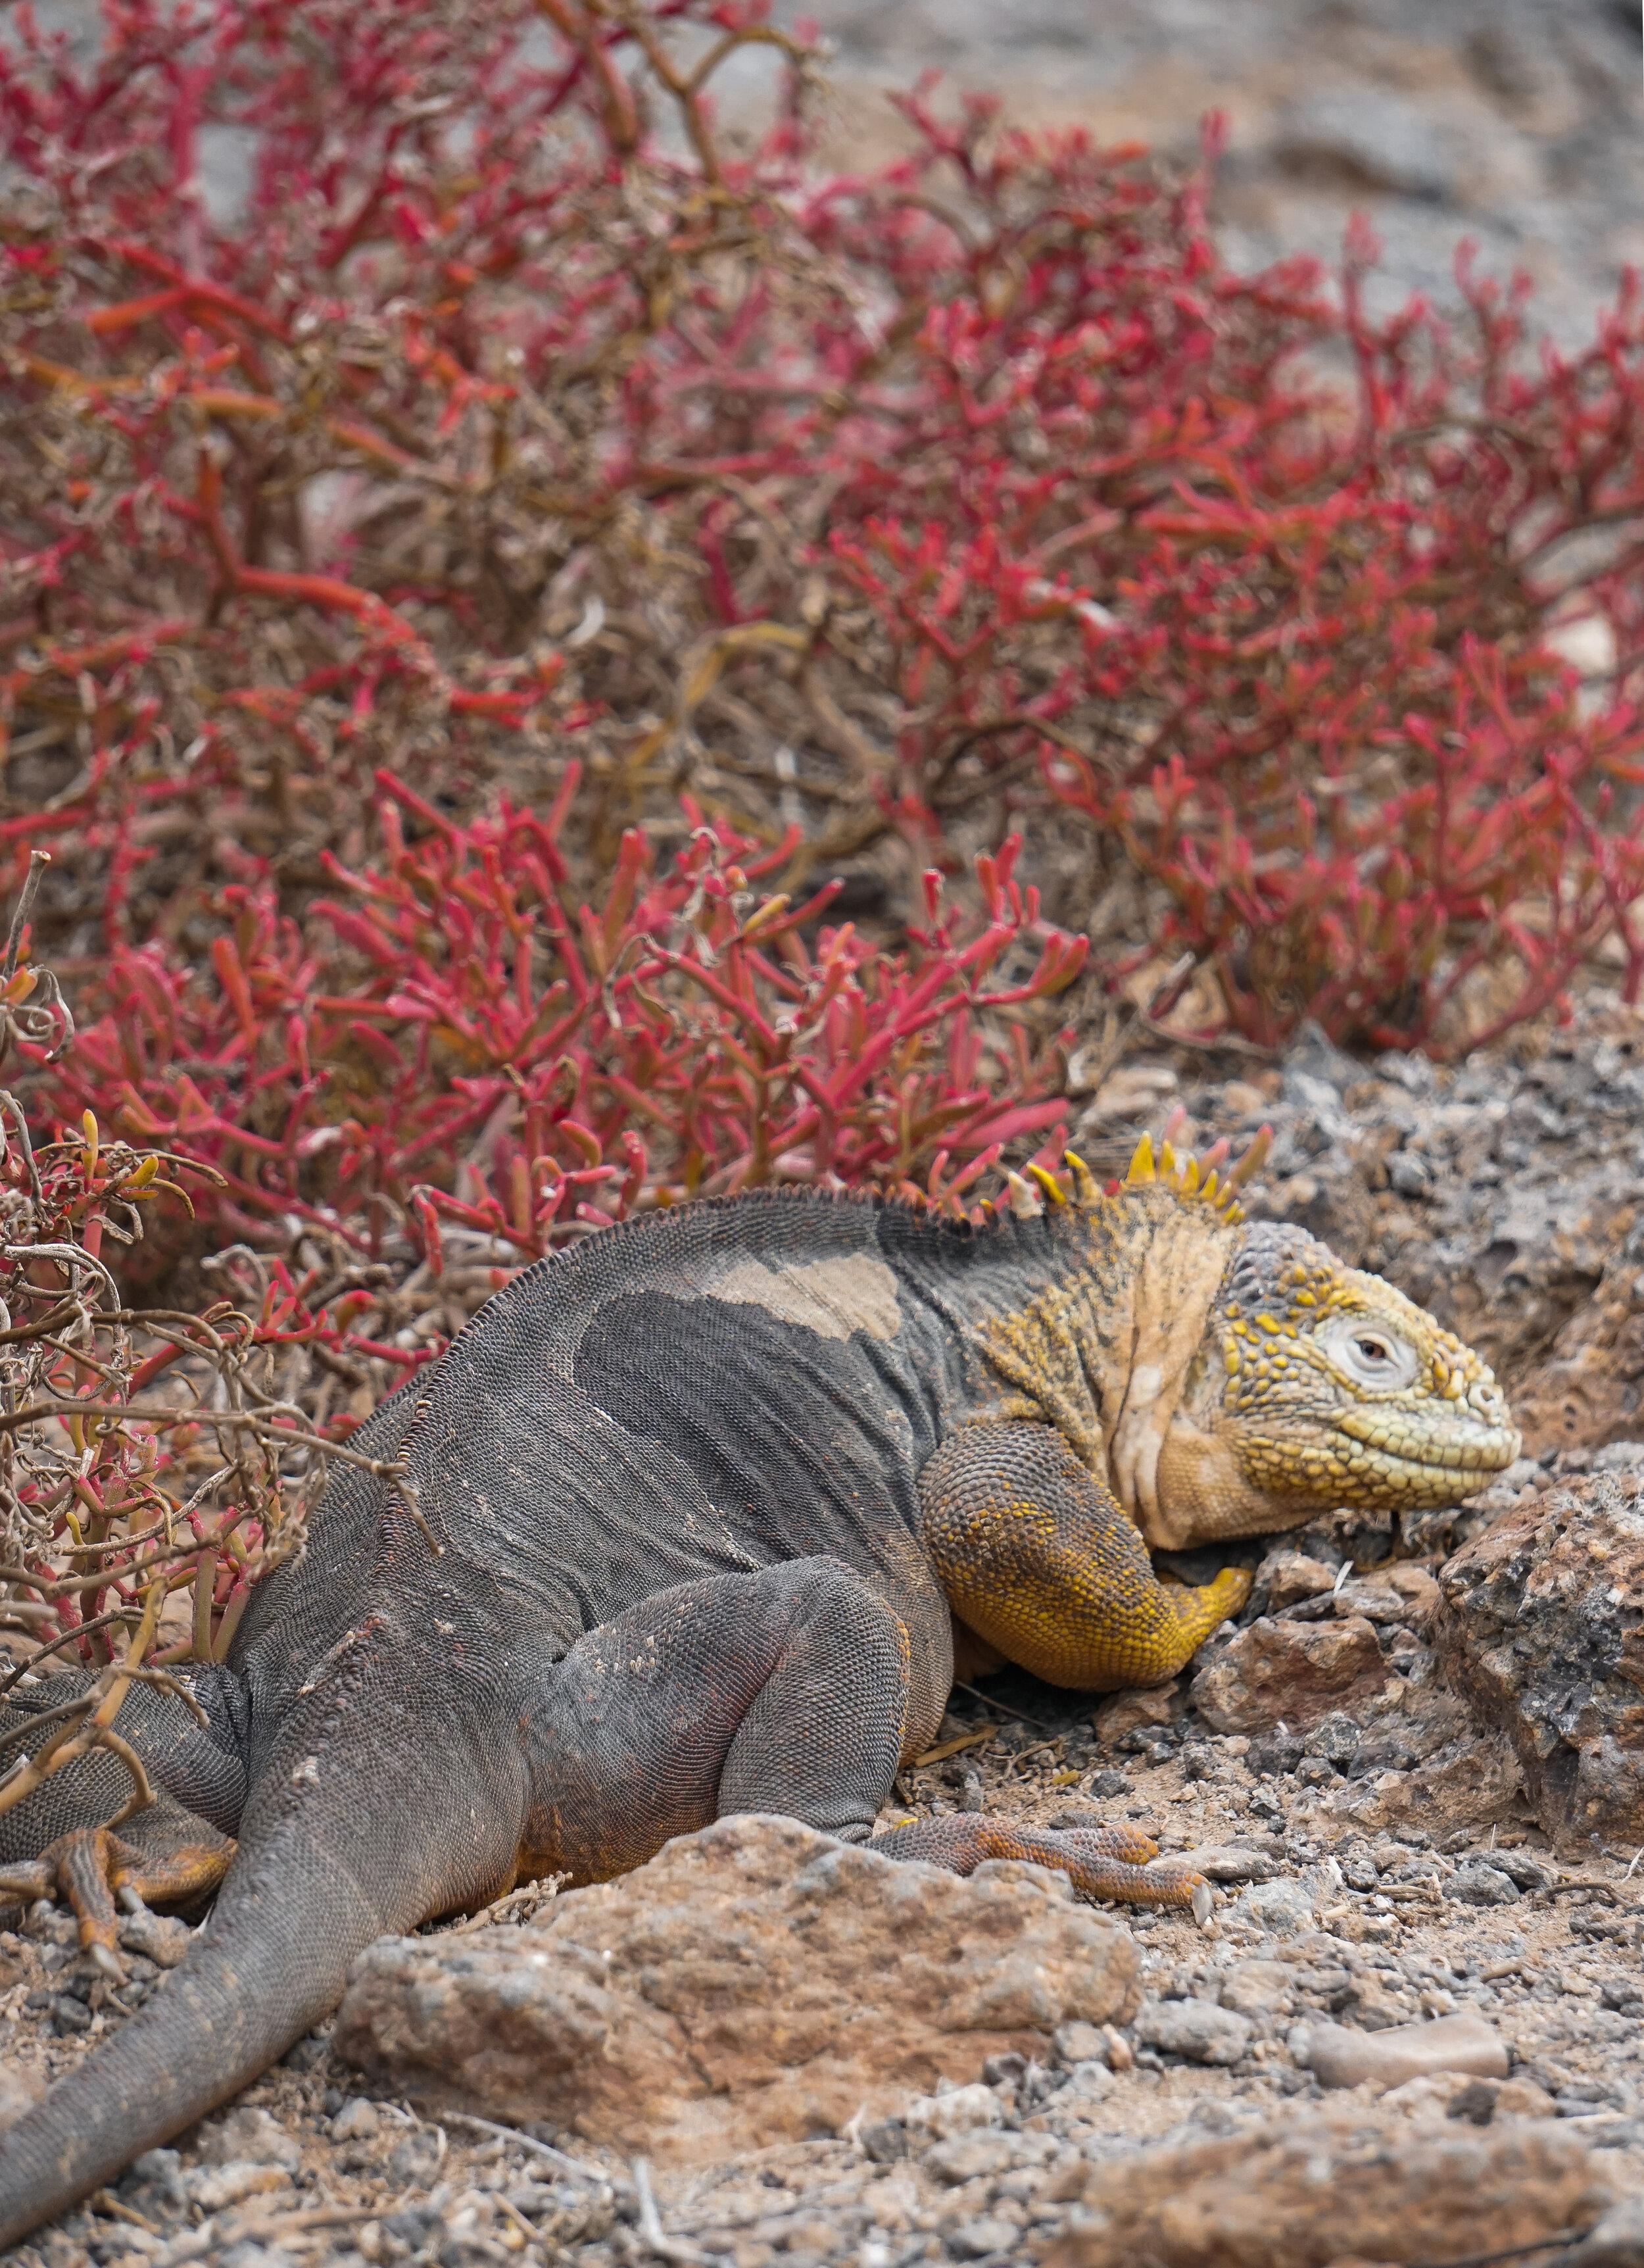 curio.trips.ecuador.galapagos.islands.land.iguana.red.plant.portrait.jpg